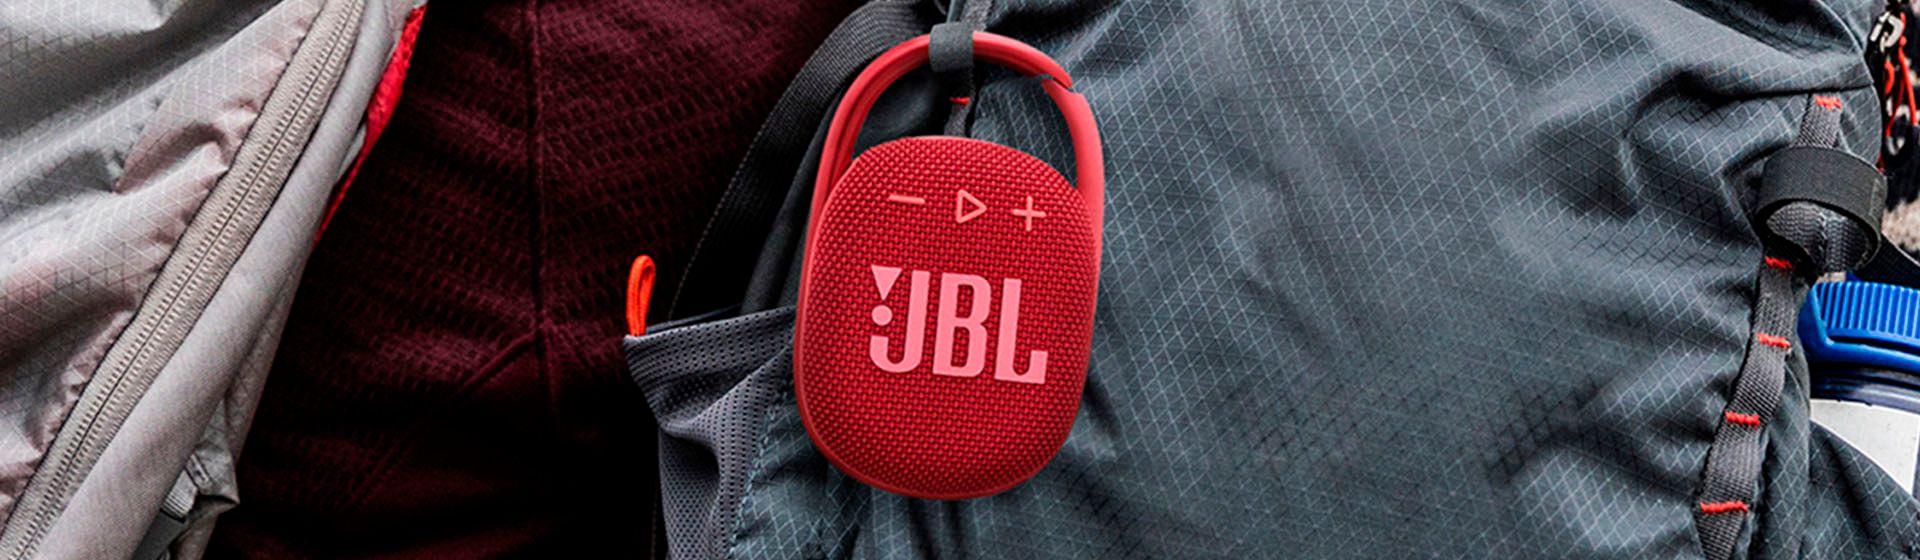 JBL Clip 4 é boa? Conheça a caixa de som portátil à prova d'água